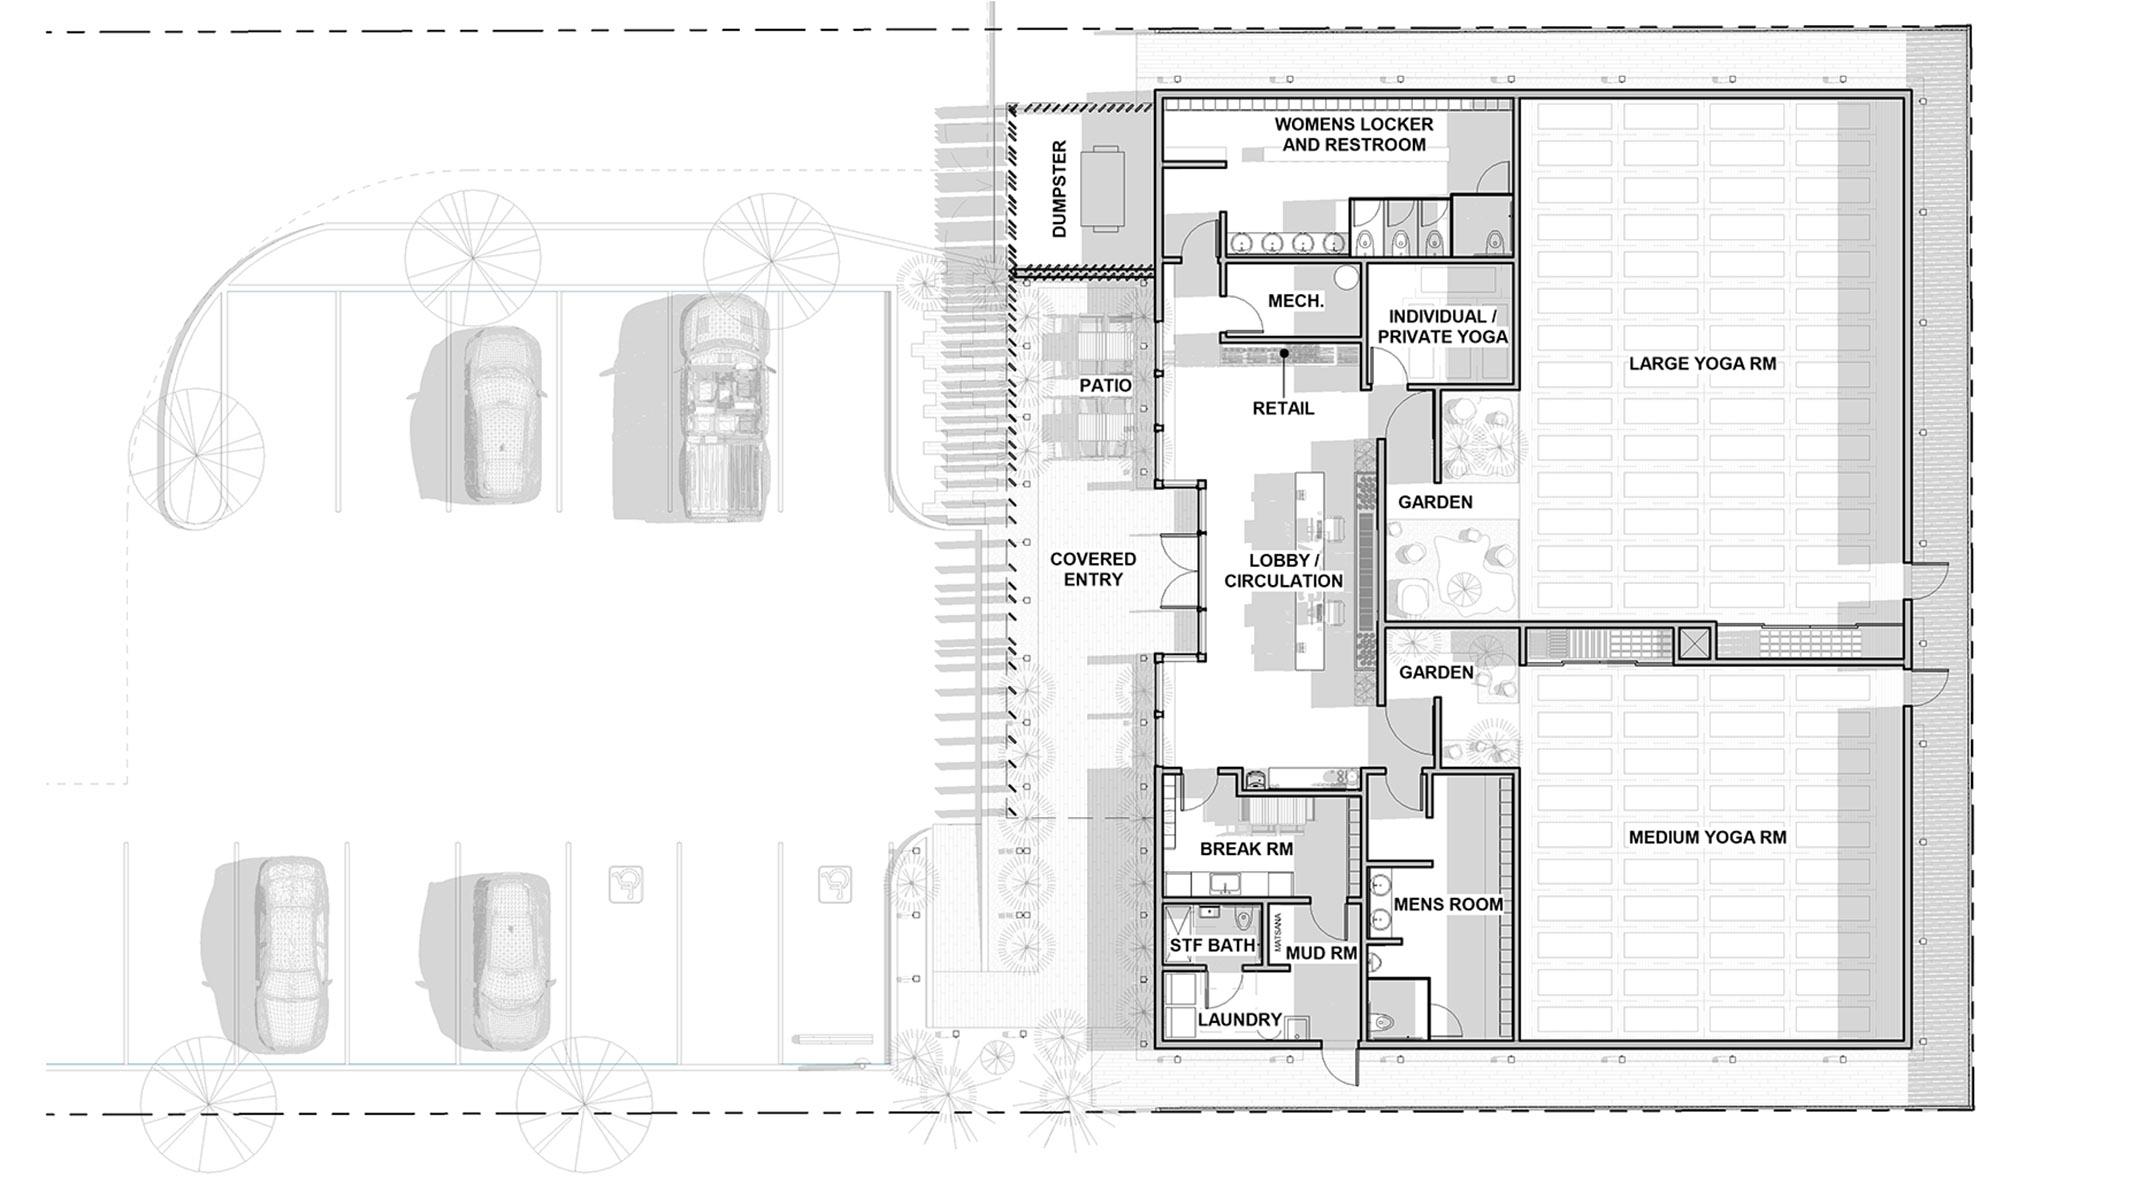 Yoga Studio Floor Plan - Propel Studio Architecture.jpg